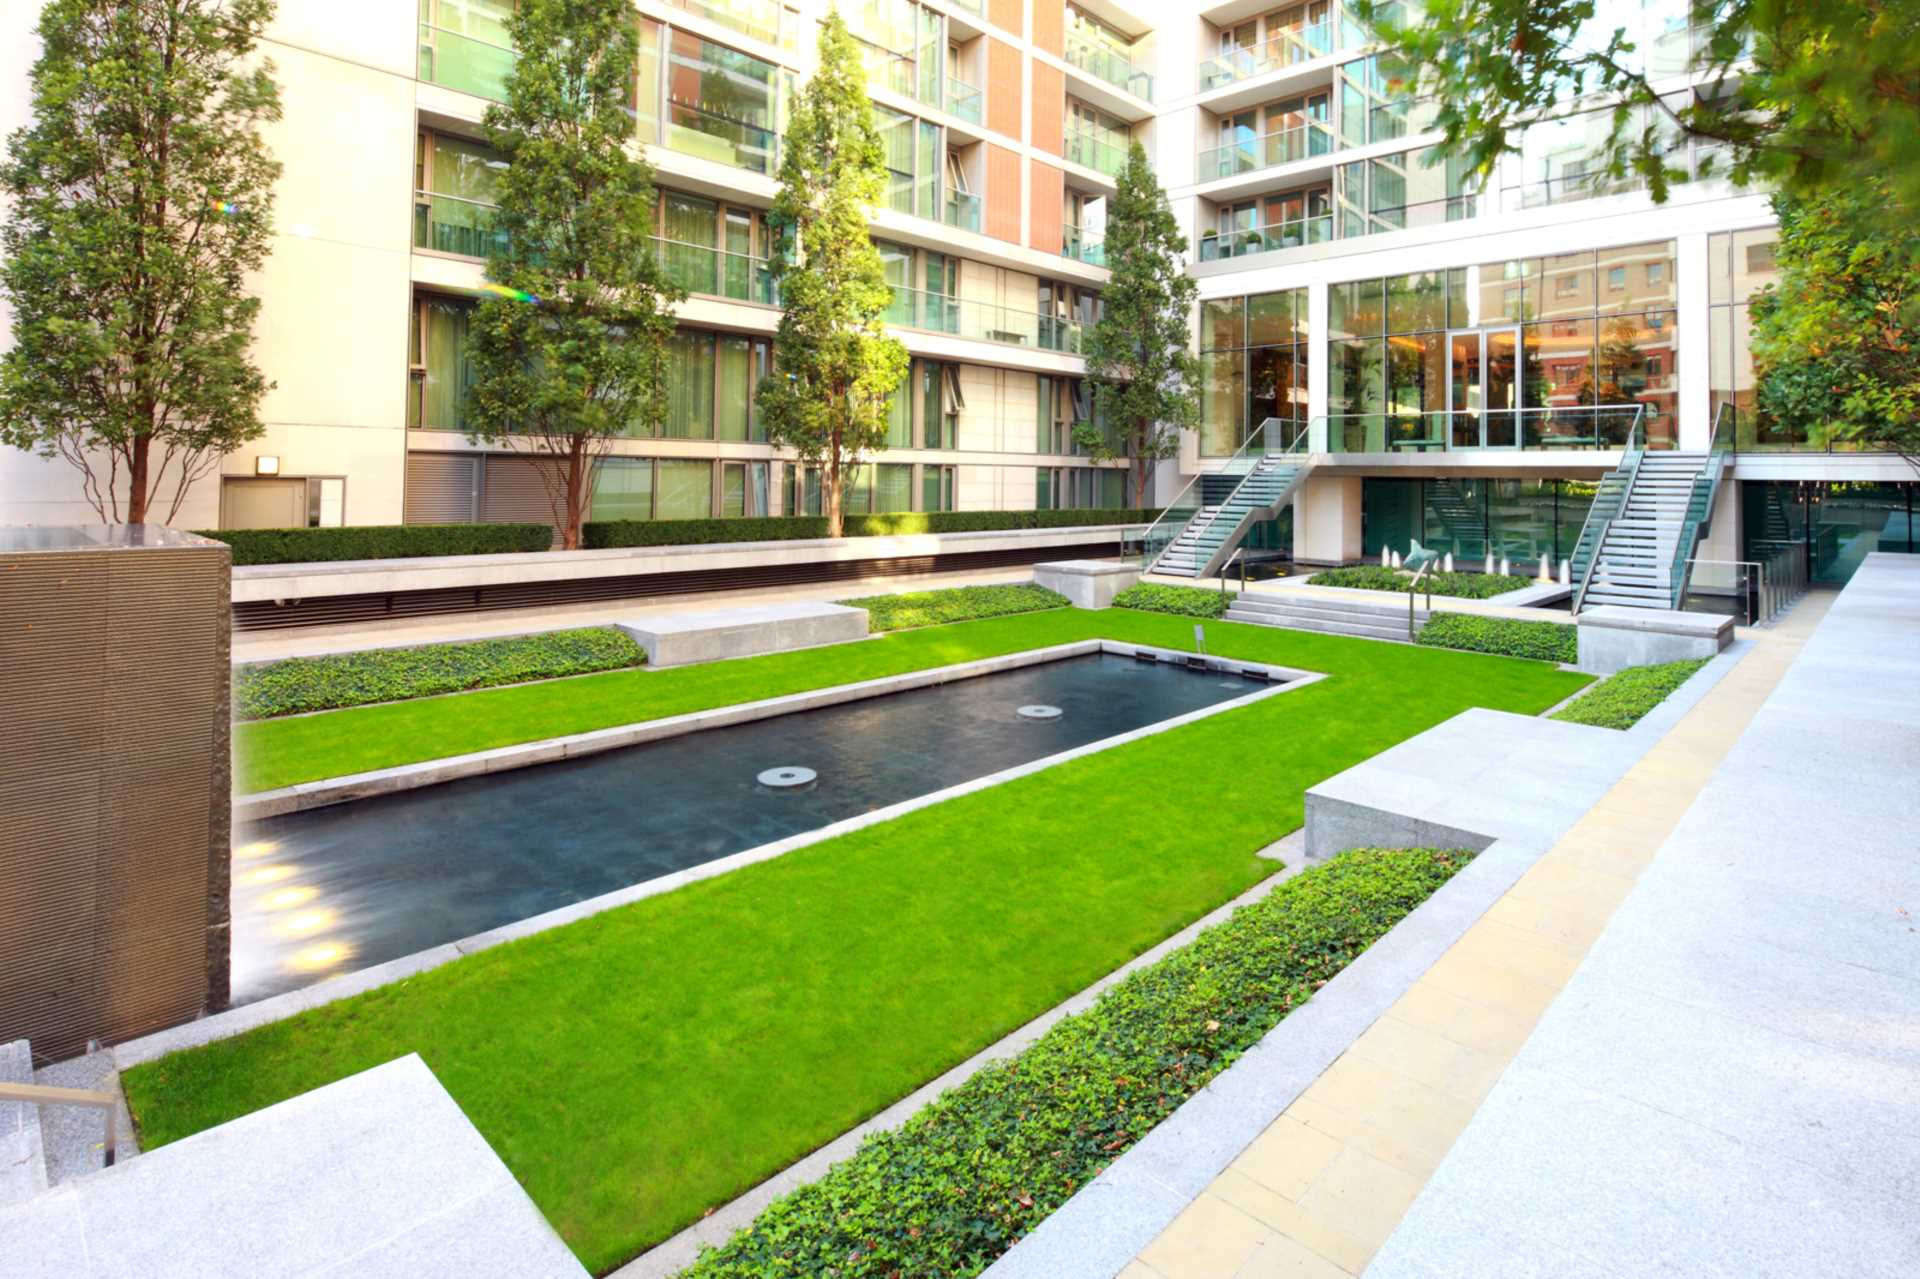 Garden Flat, The Knightsbridge, Image 12